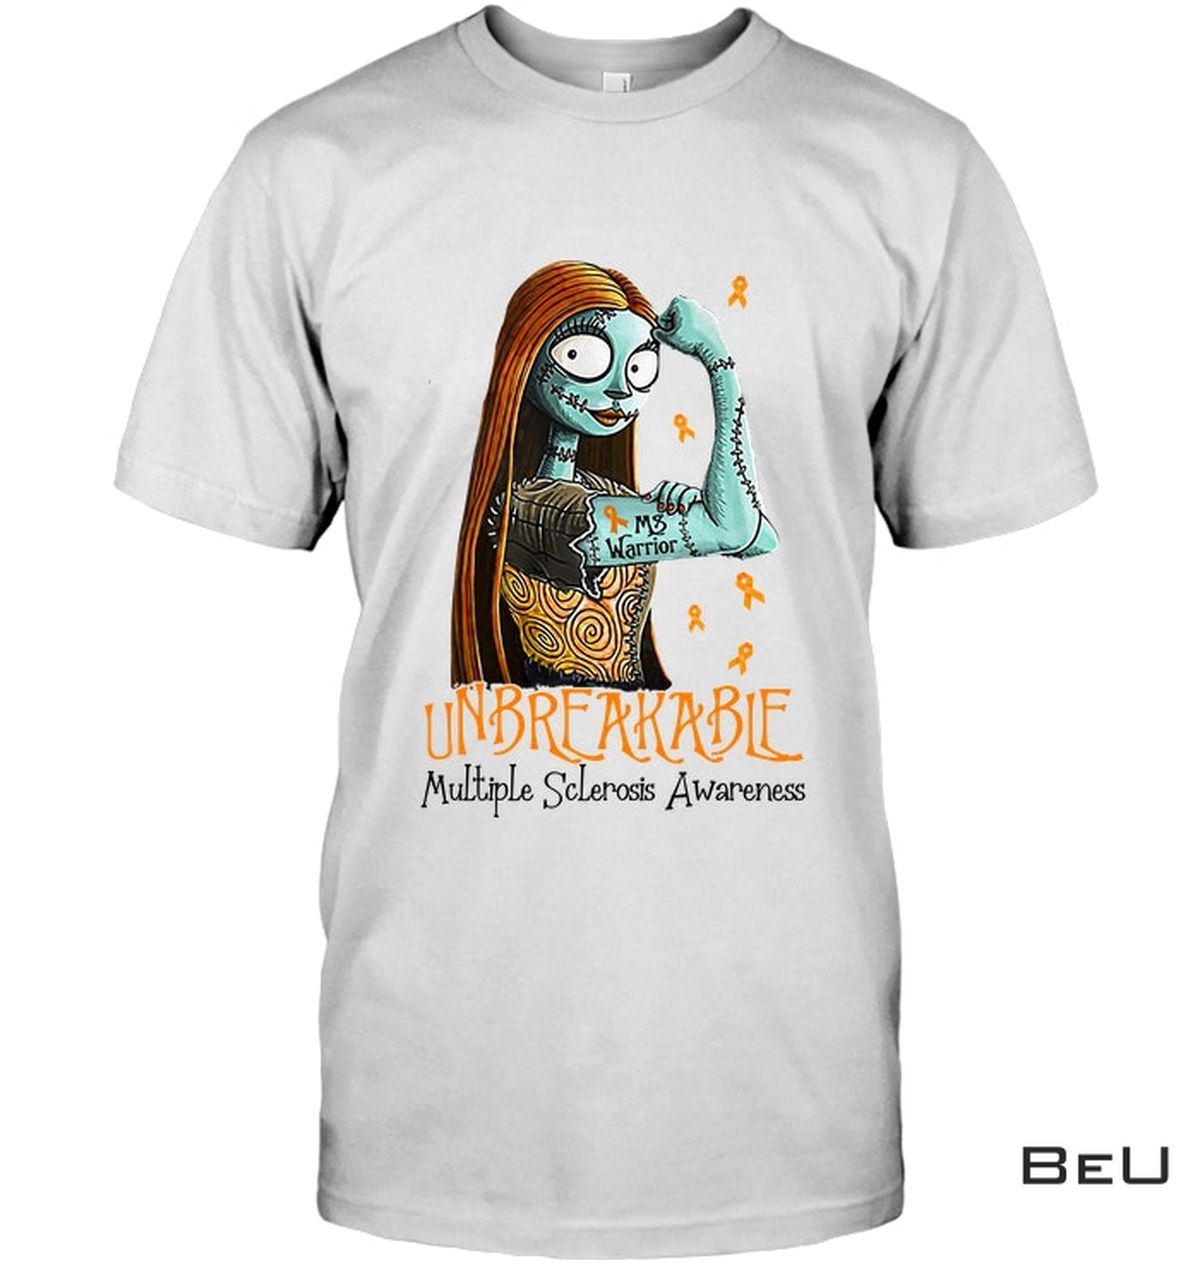 Adult Sally Unbreakable Multiple Sclerosis Awareness Shirt, Hoodie, Tank Top